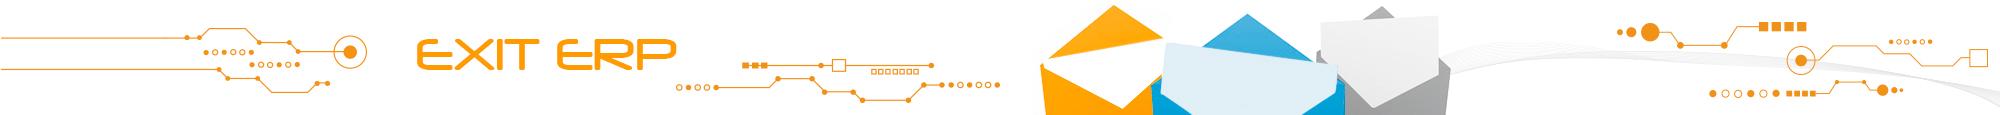 ERP software de gestión para empresas en Galicia Blog